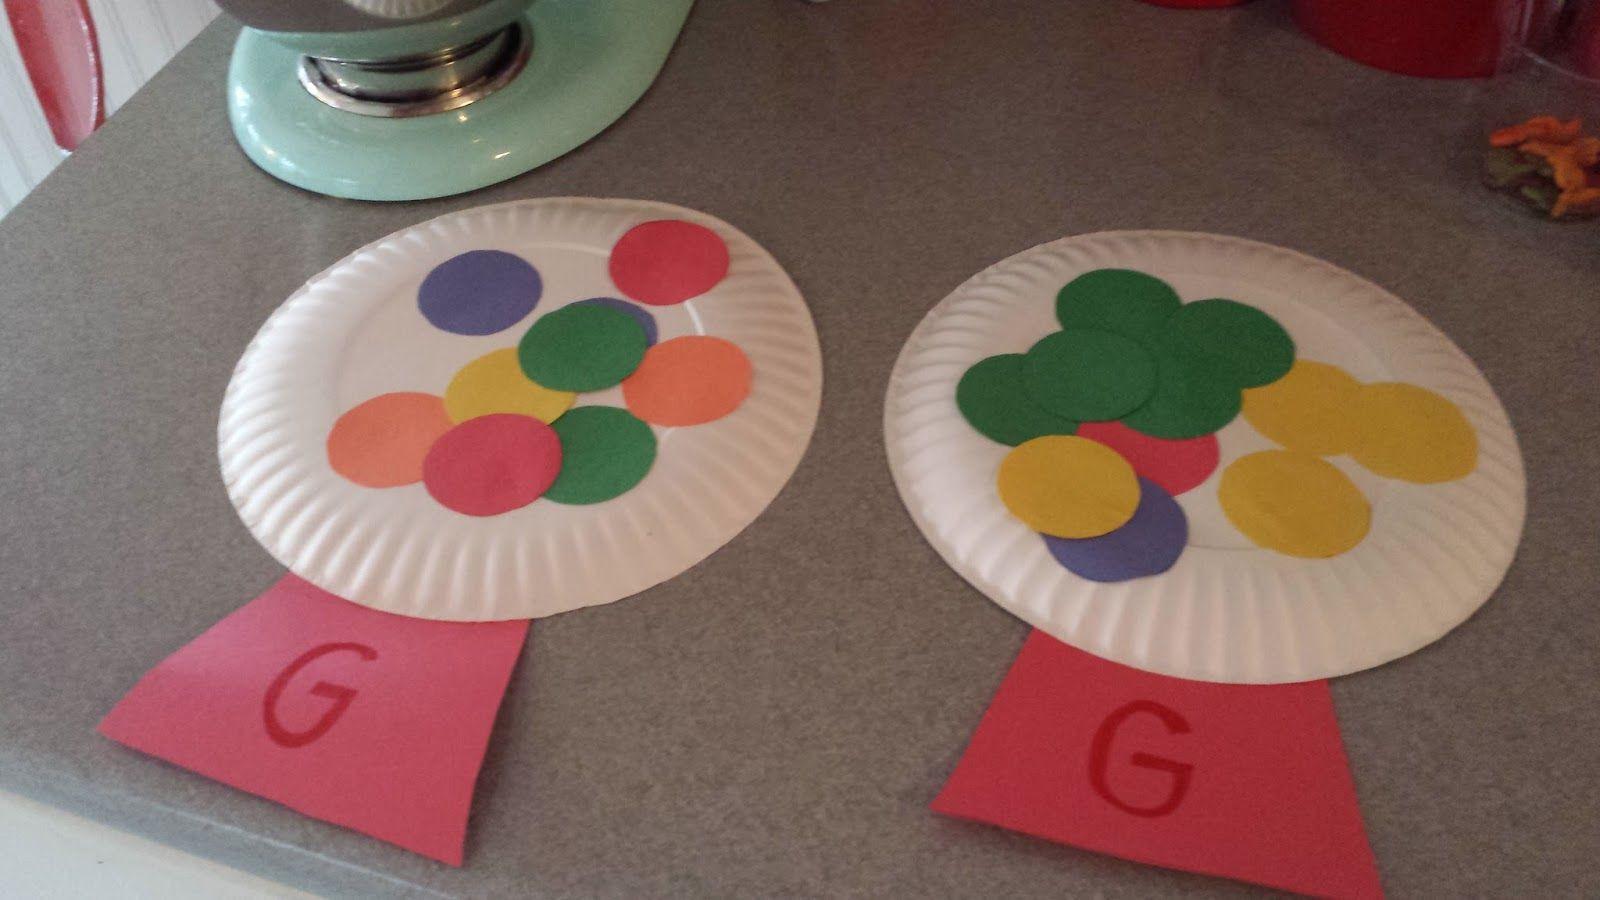 Preschool Arts And Crafts Ideas  Letter G Crafts Preschool and Kindergarten